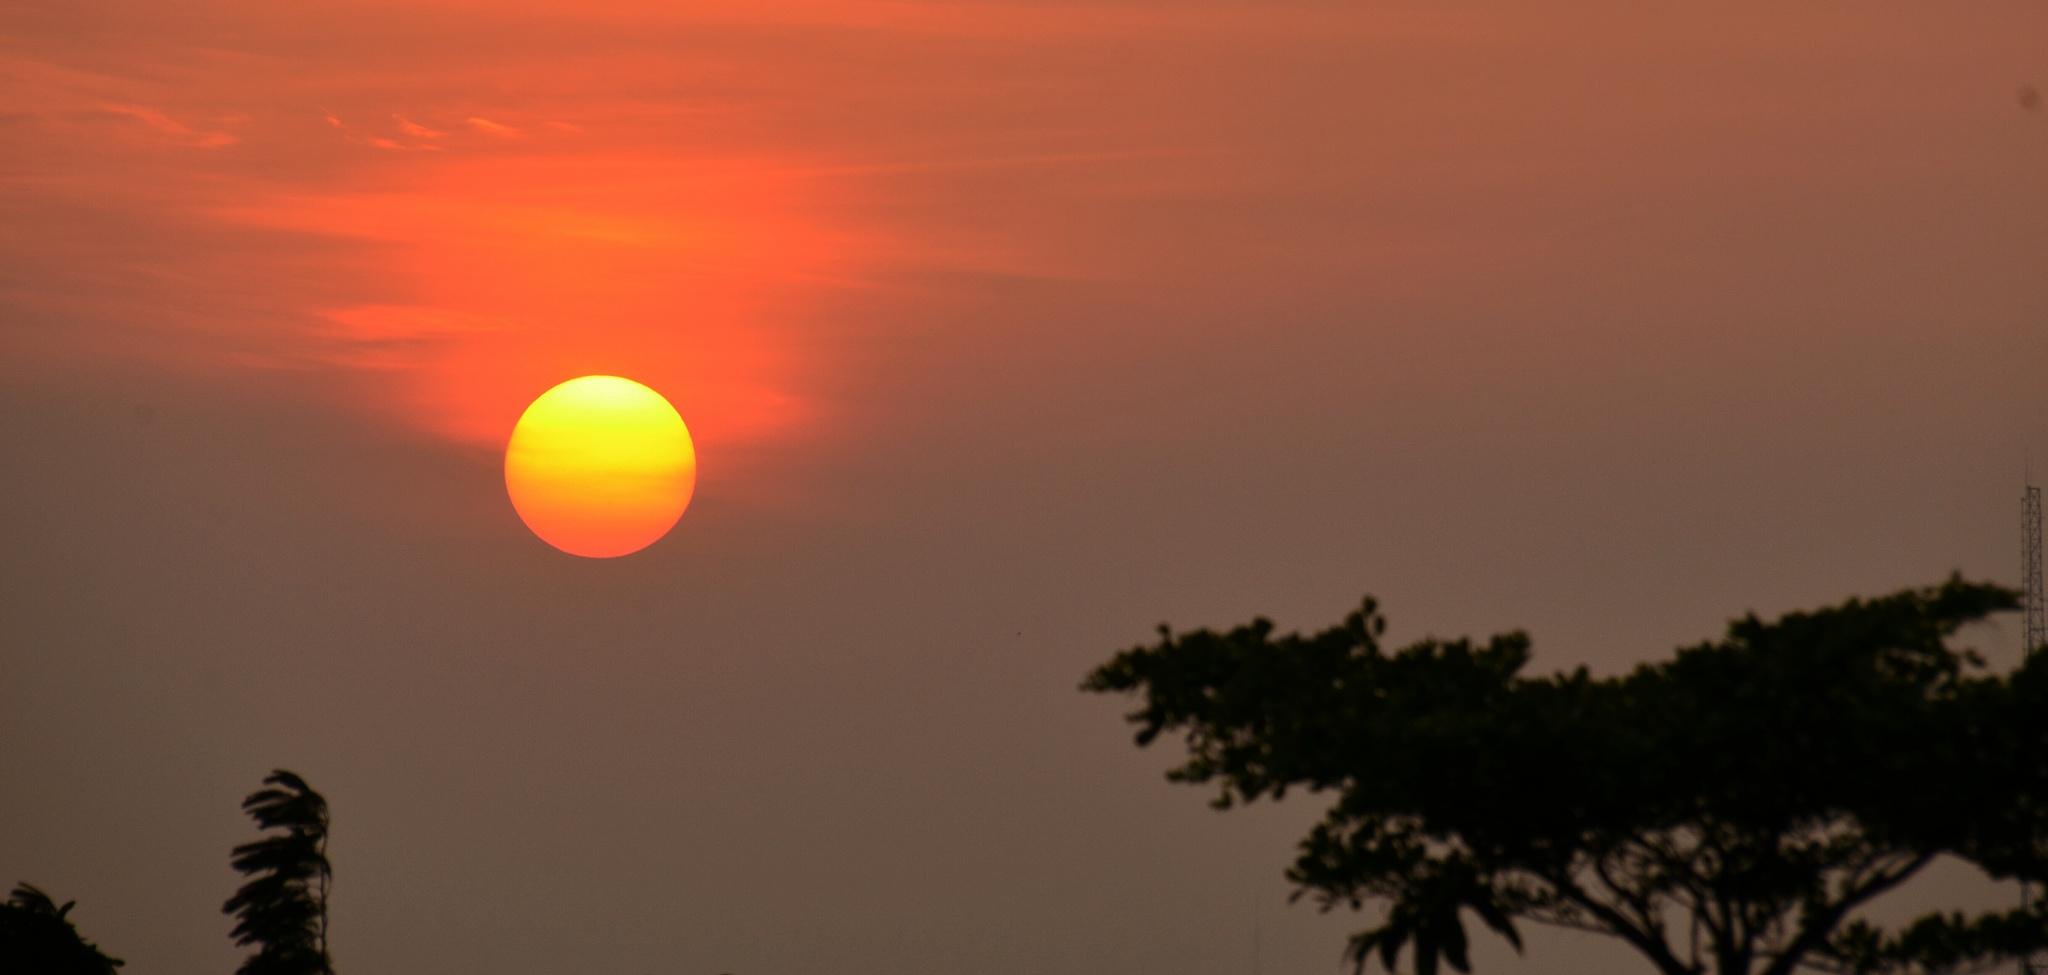 Sunset in Jakarta by bambang irawan